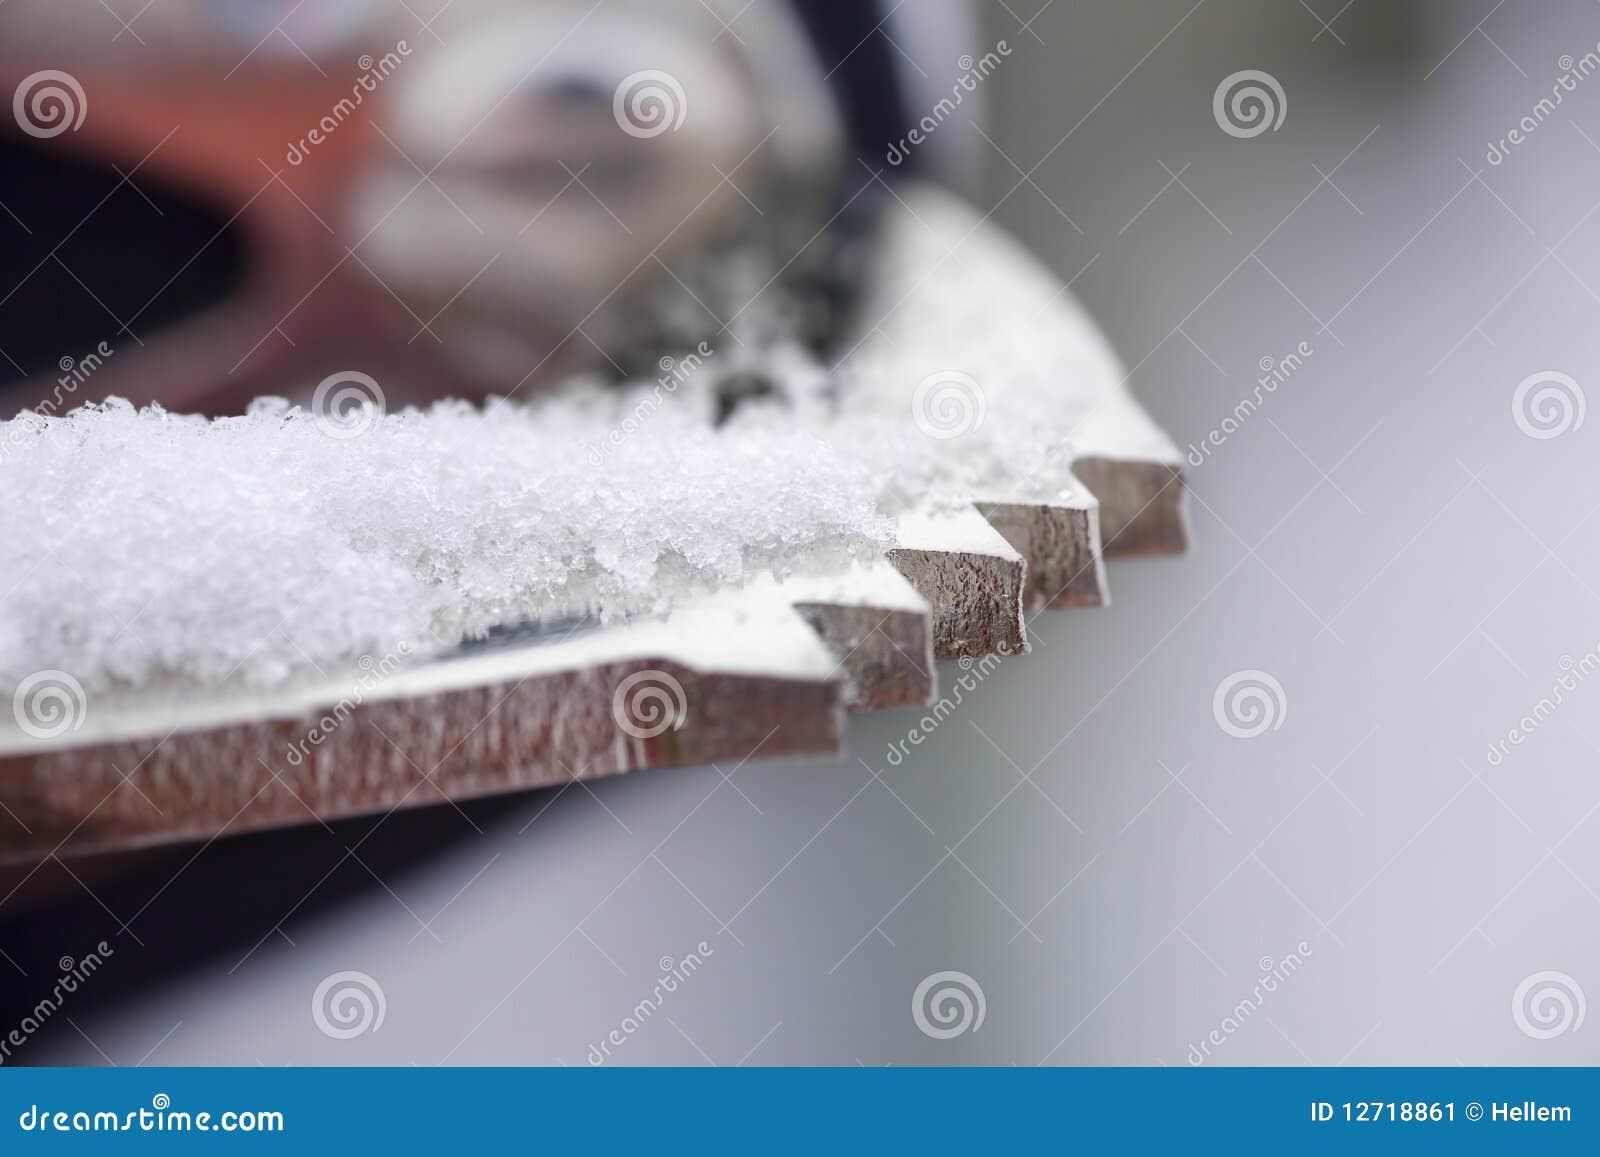 Skate Detail